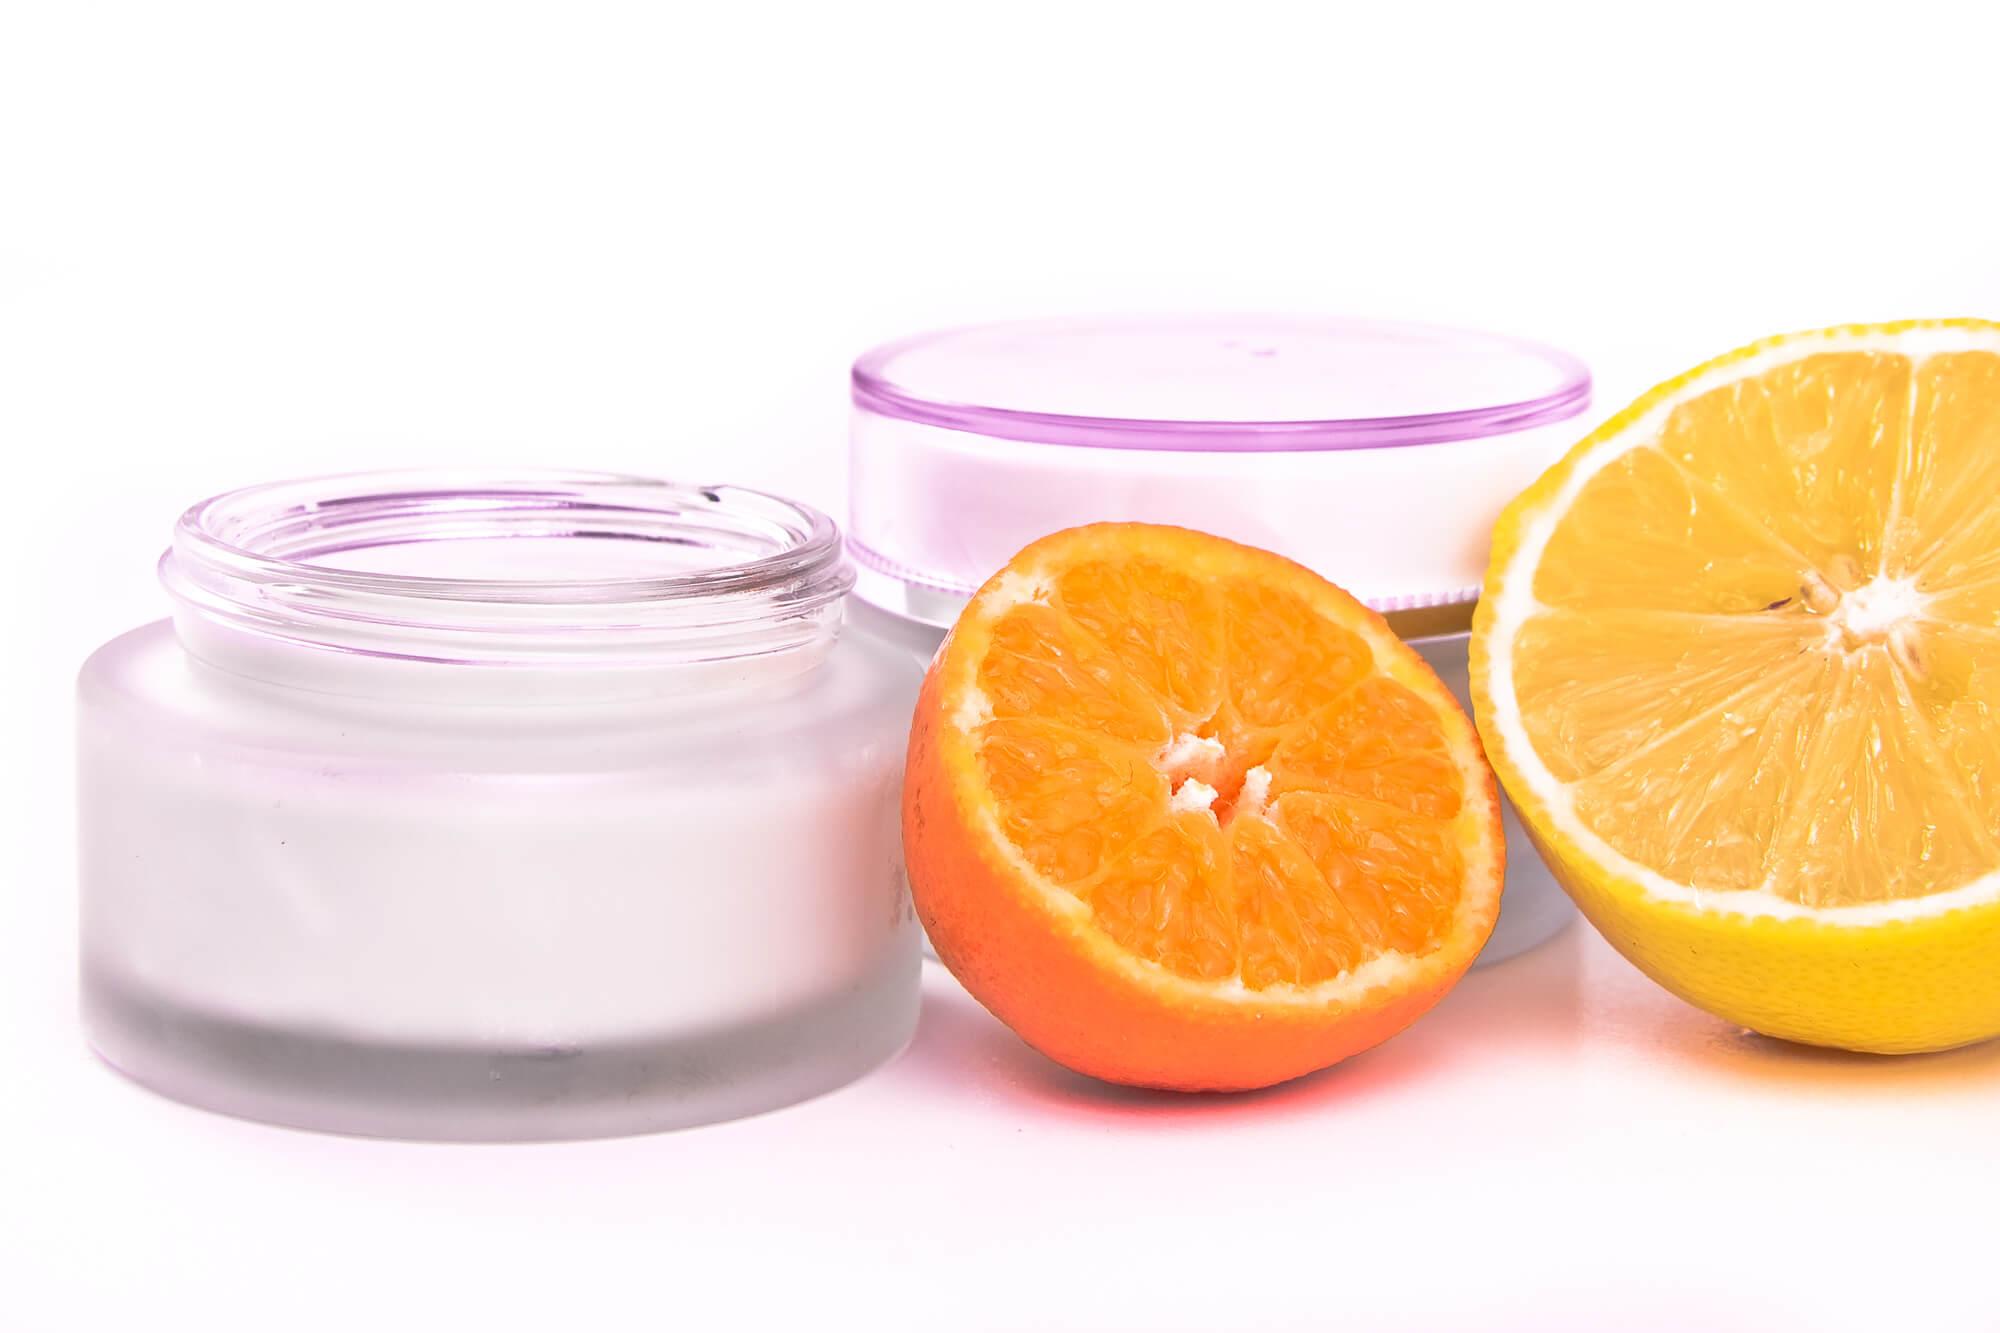 health benefits of eating citrus